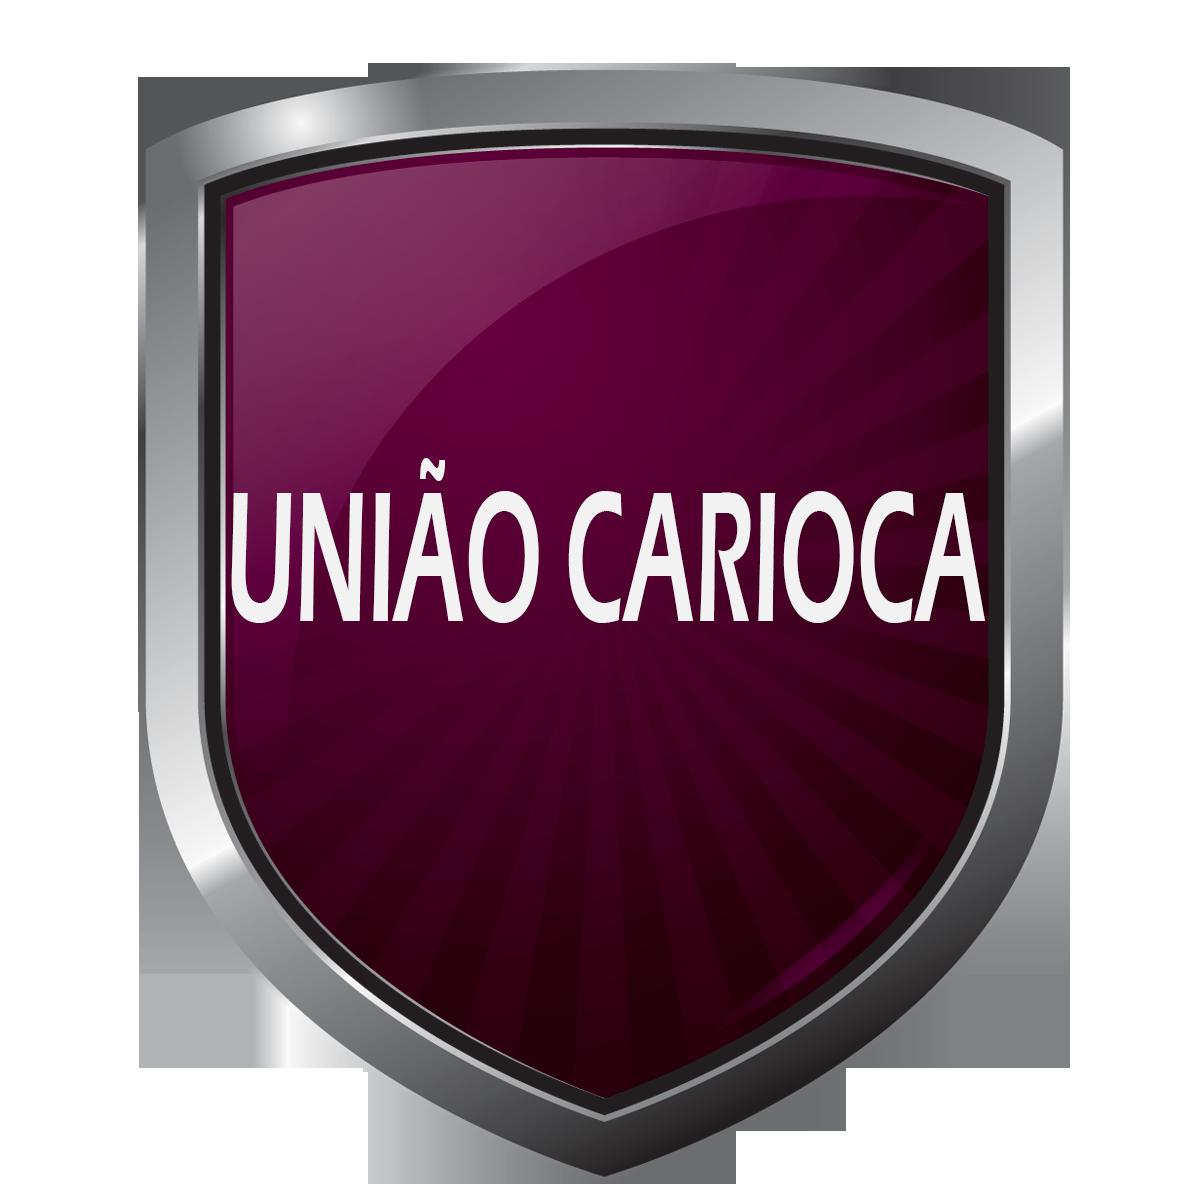 Uniao carioca